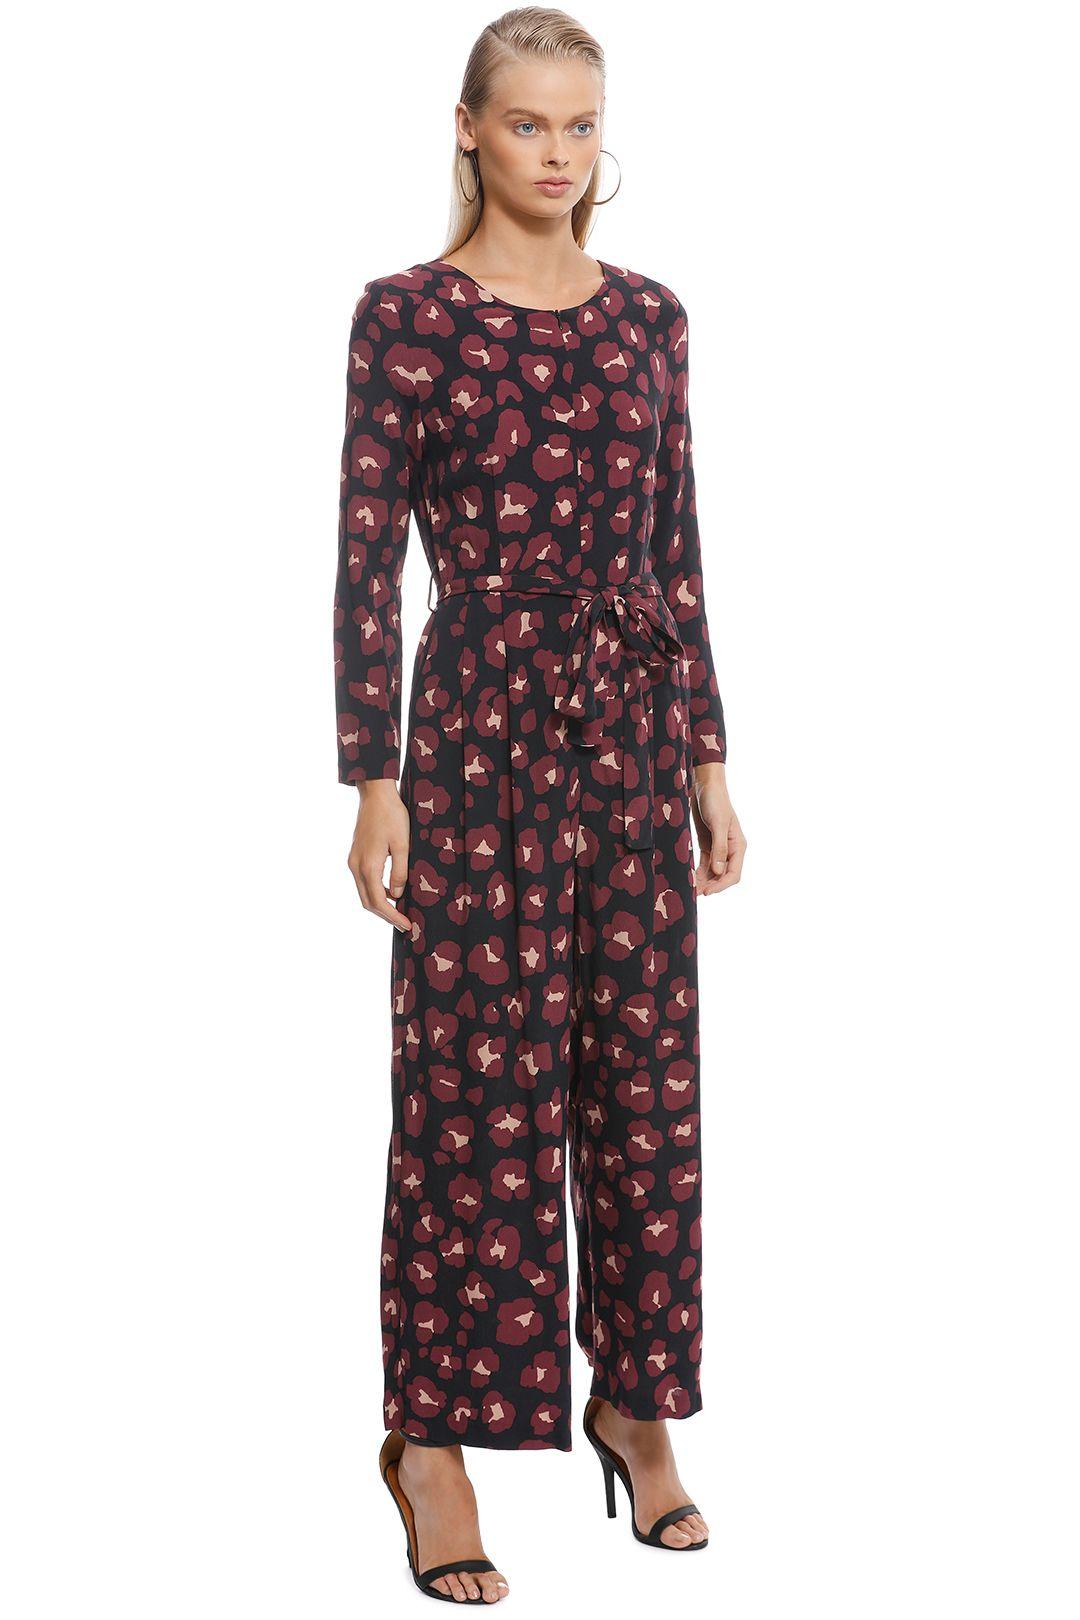 Gorman - Leopard Print Pantsuit - Print - Side